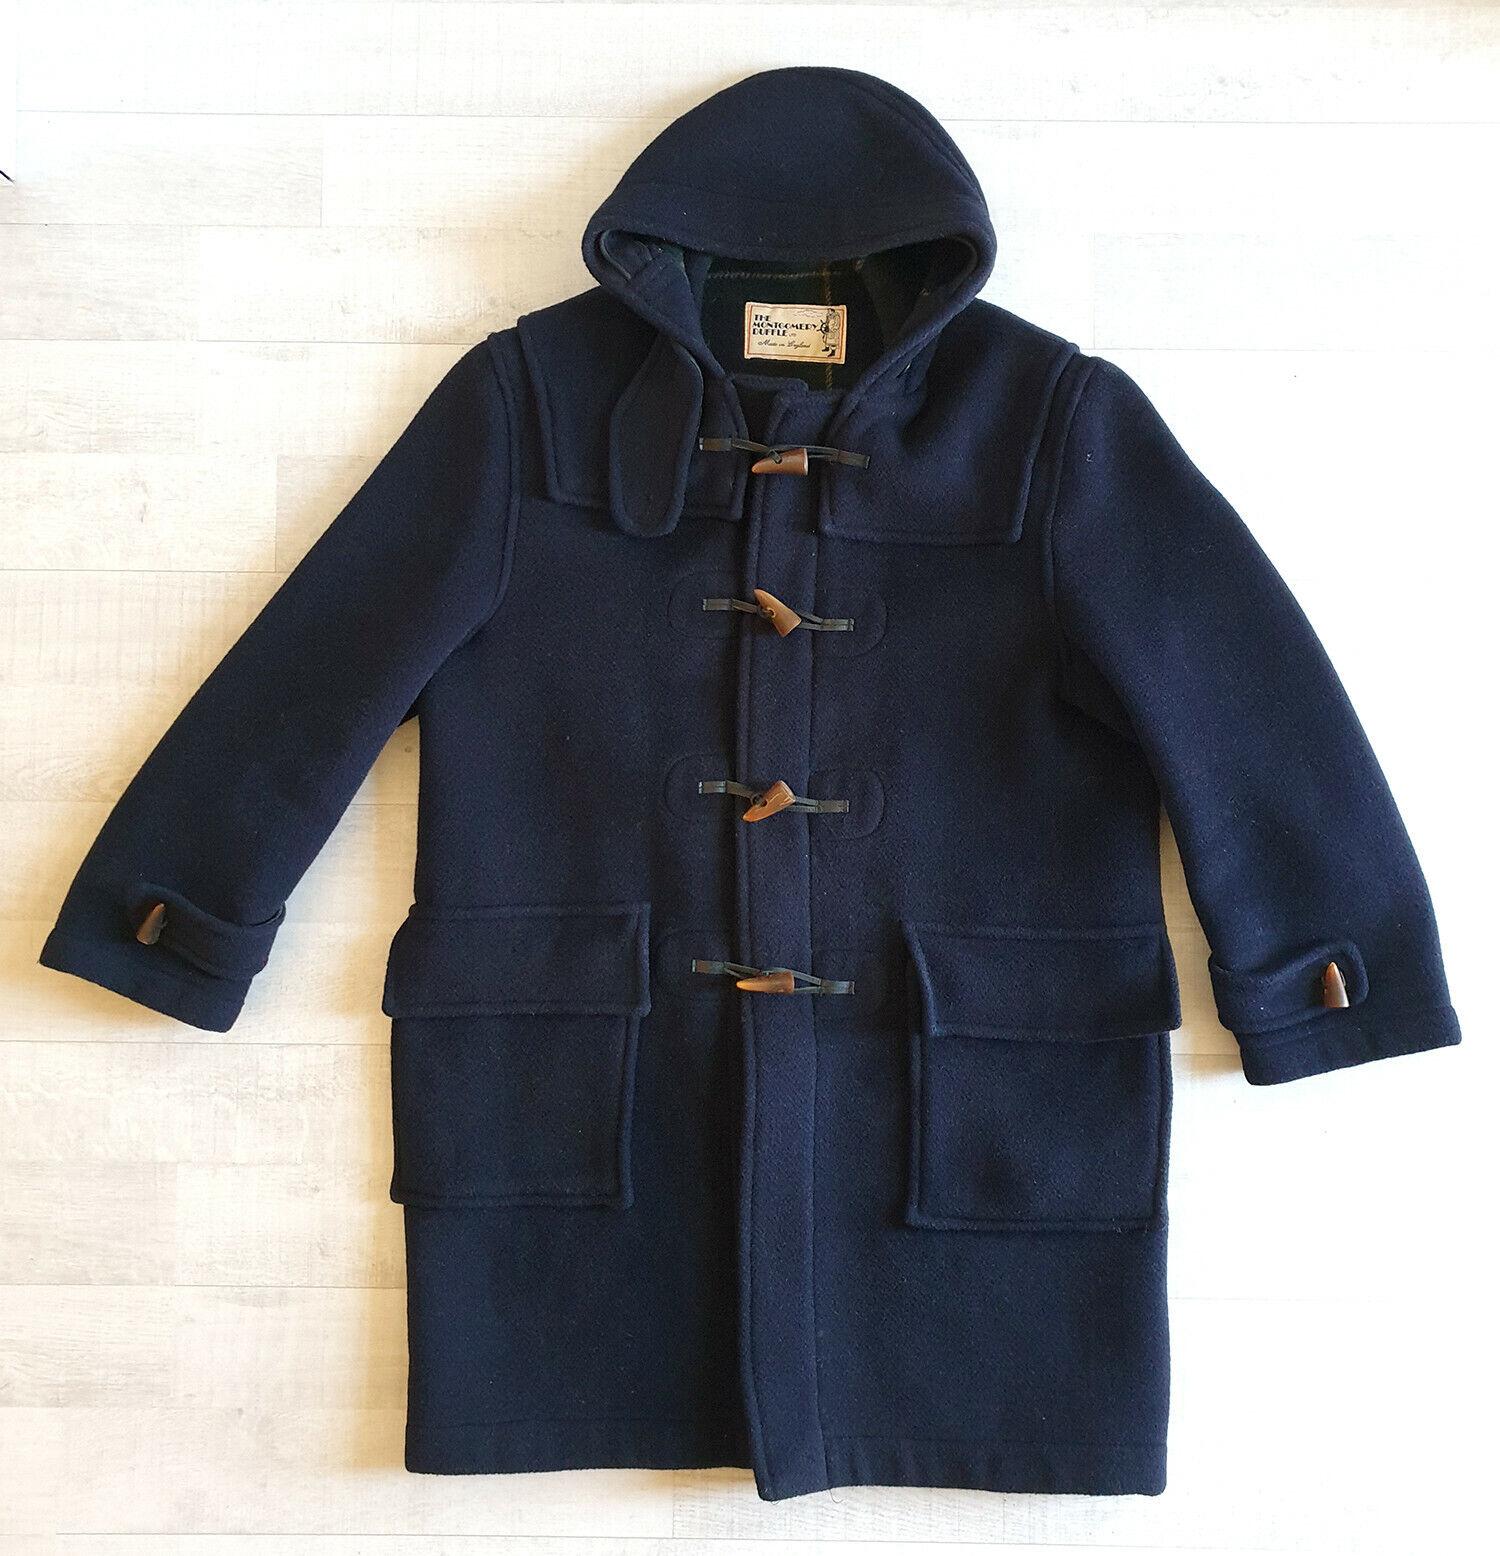 Manteau duffle coat taille l (52) homme montgomery bleu marine